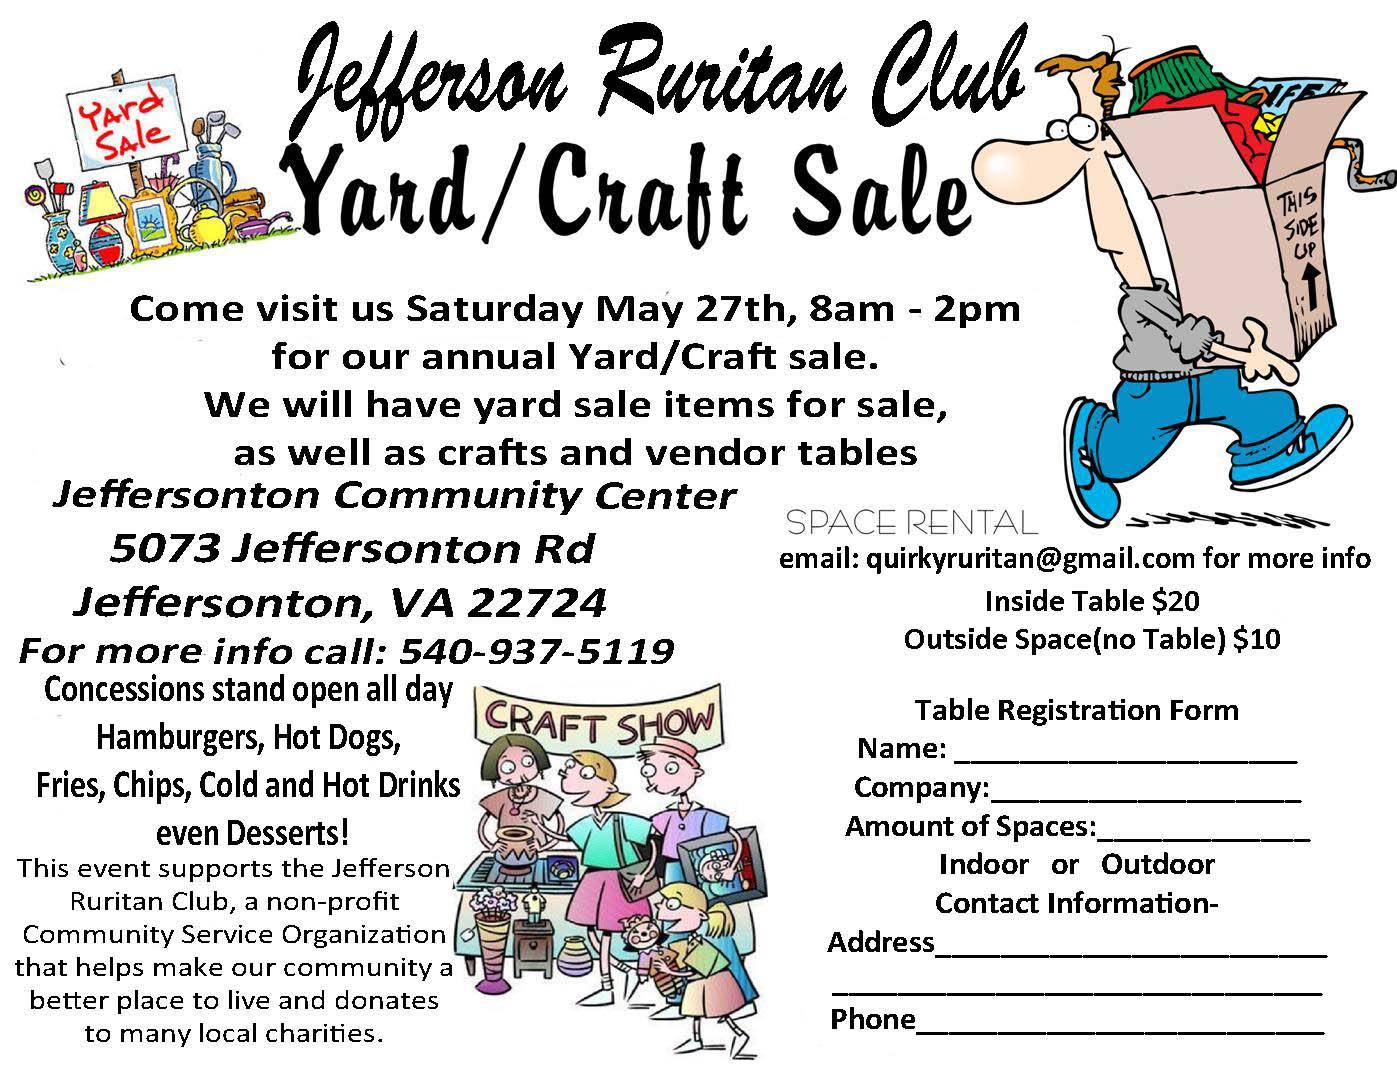 Jefferson Ruritan Club May 2017 Craft Sale